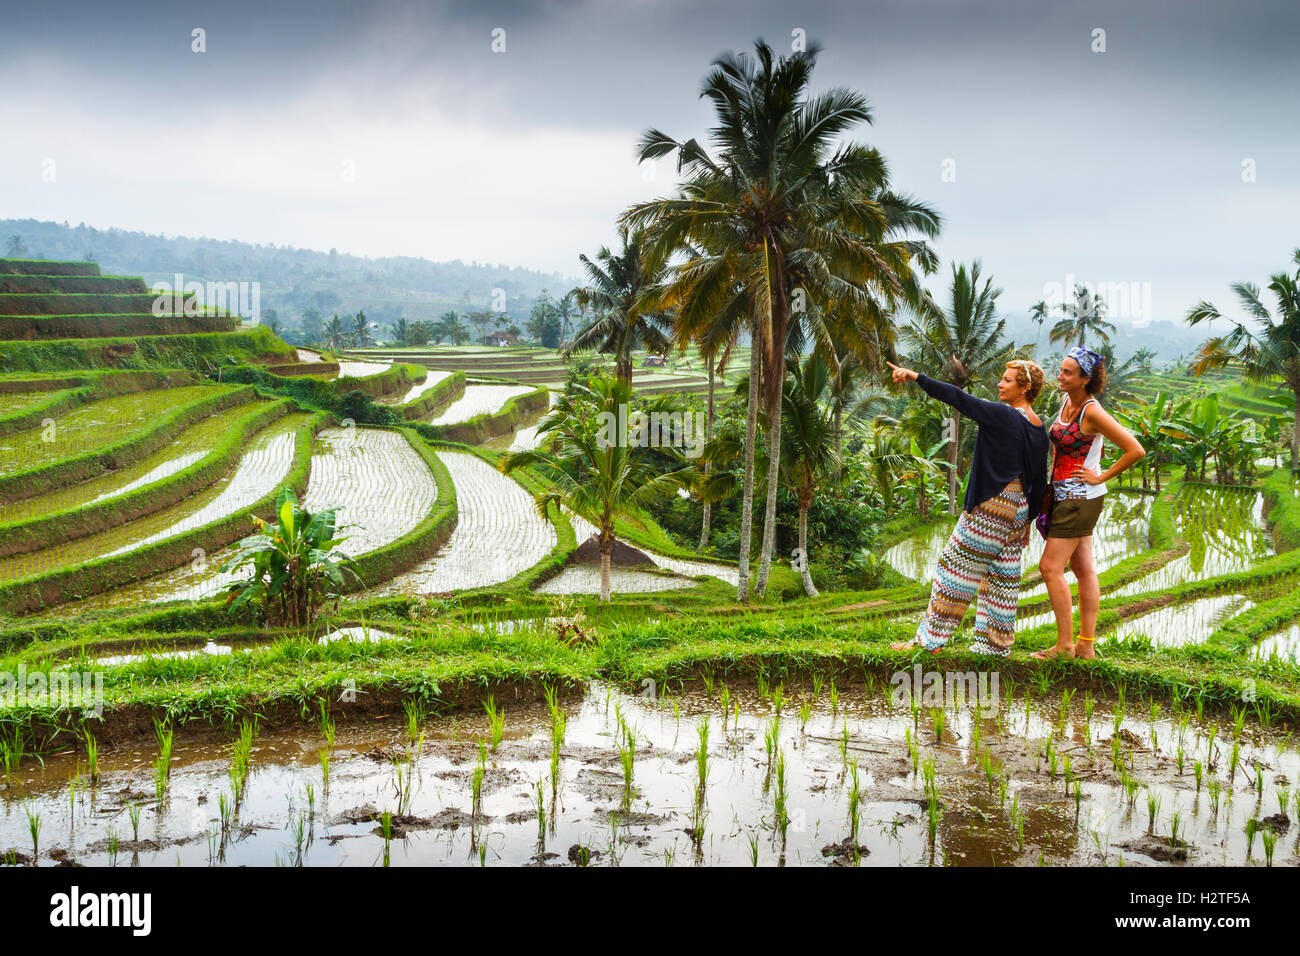 Two tourists in Jatiluwih rice terraces. Bali. Indonesia, Asia. - Stock Image